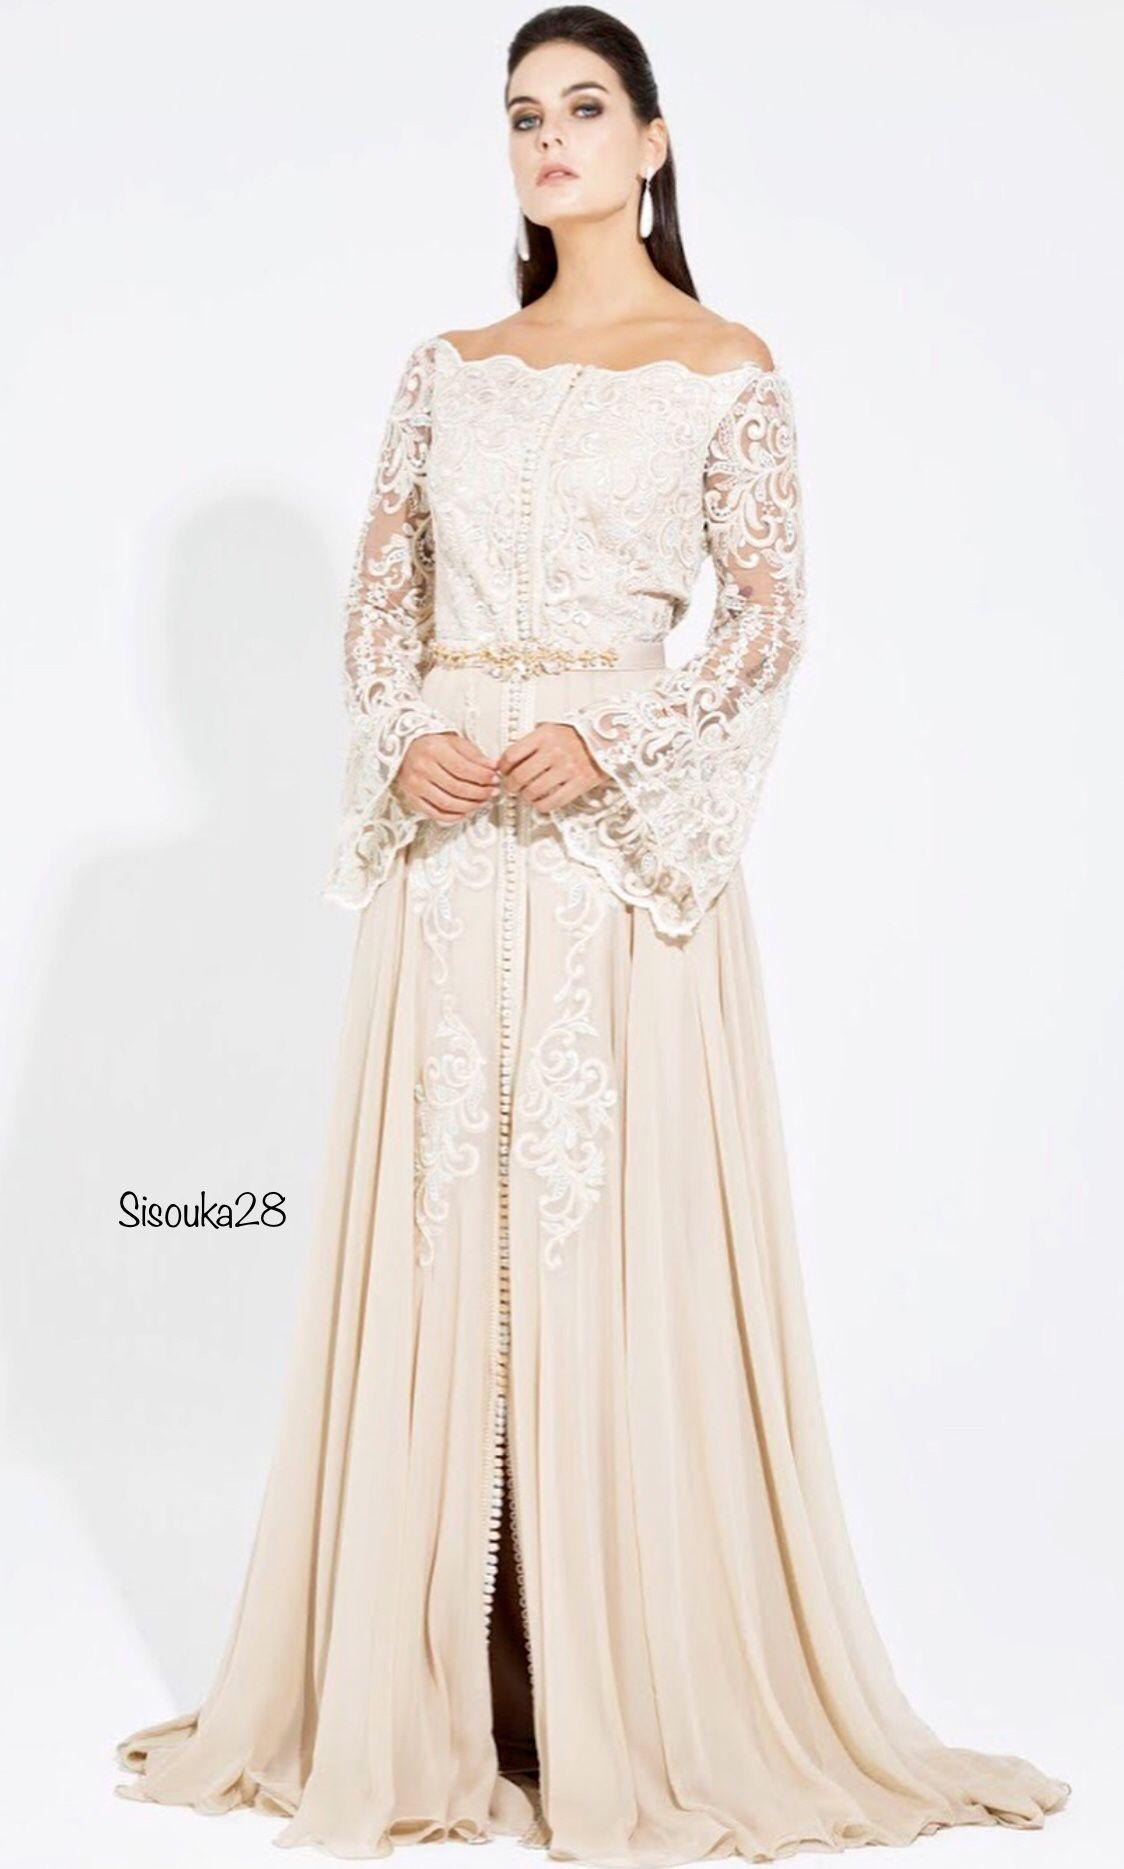 صوفيا بن يحيى Amazing Dresses dc0b19cfdc8